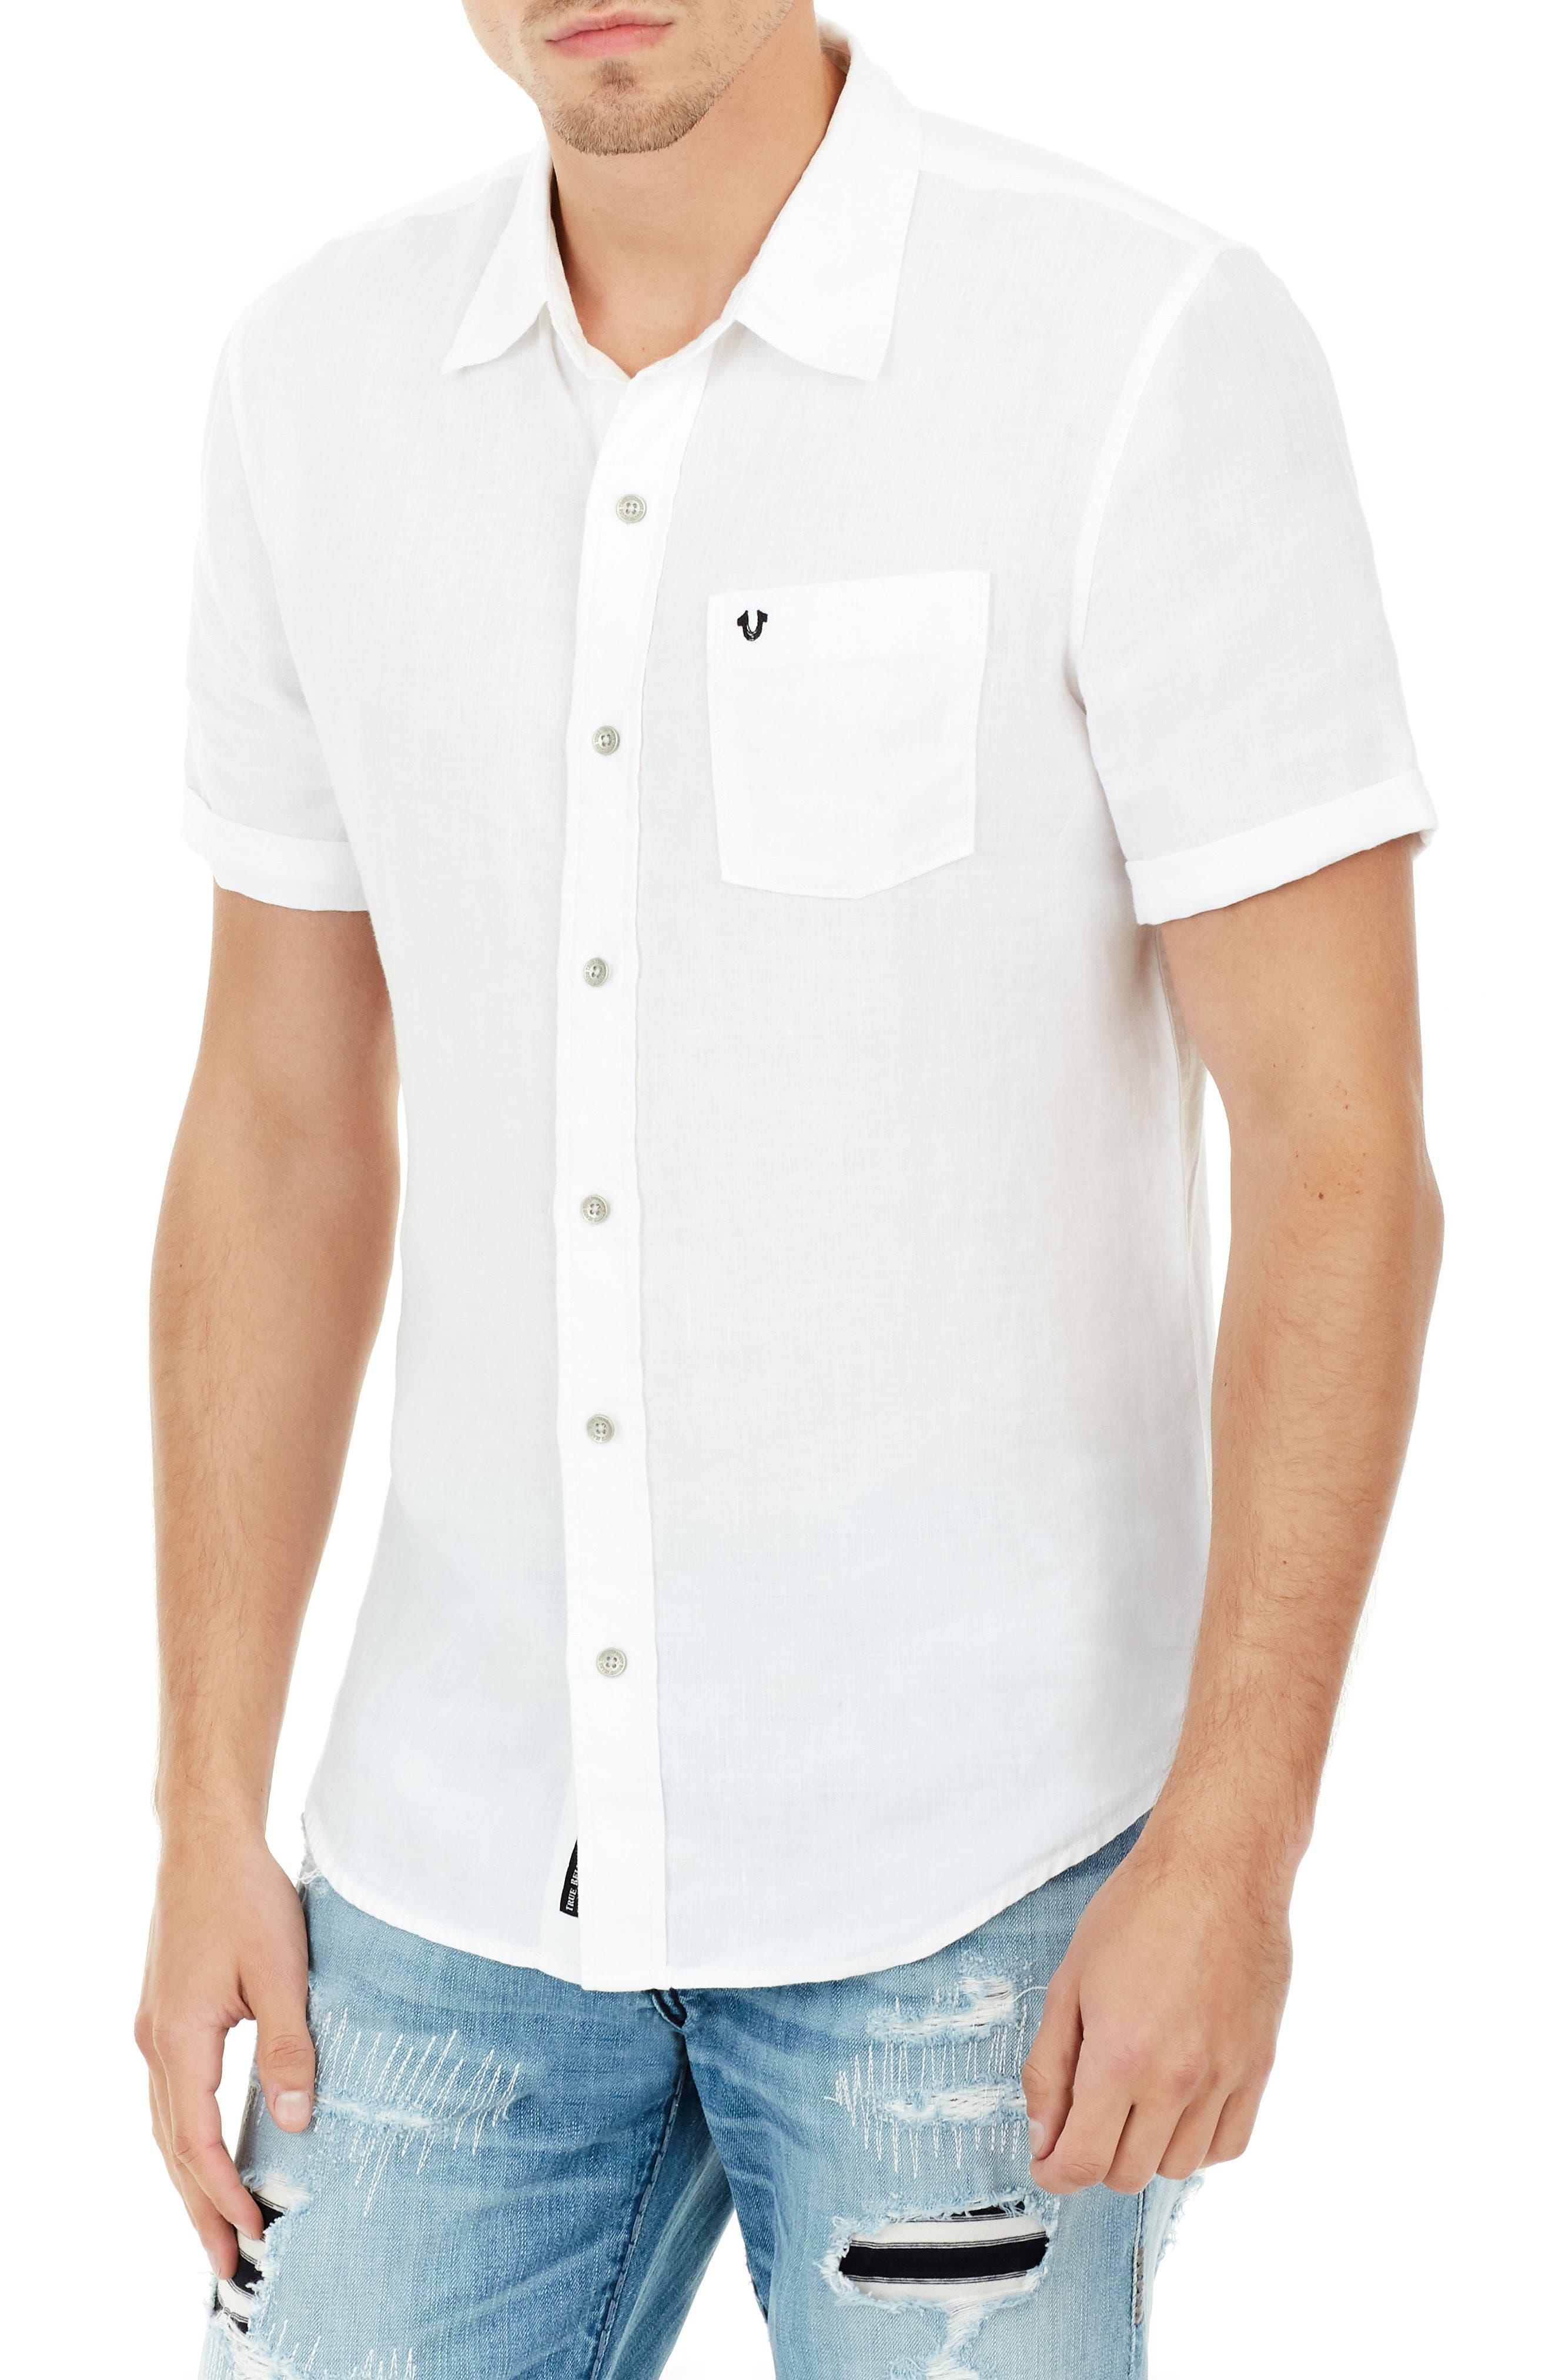 Main Image - True Religion Brand Jeans Roll Cuff Linen Shirt